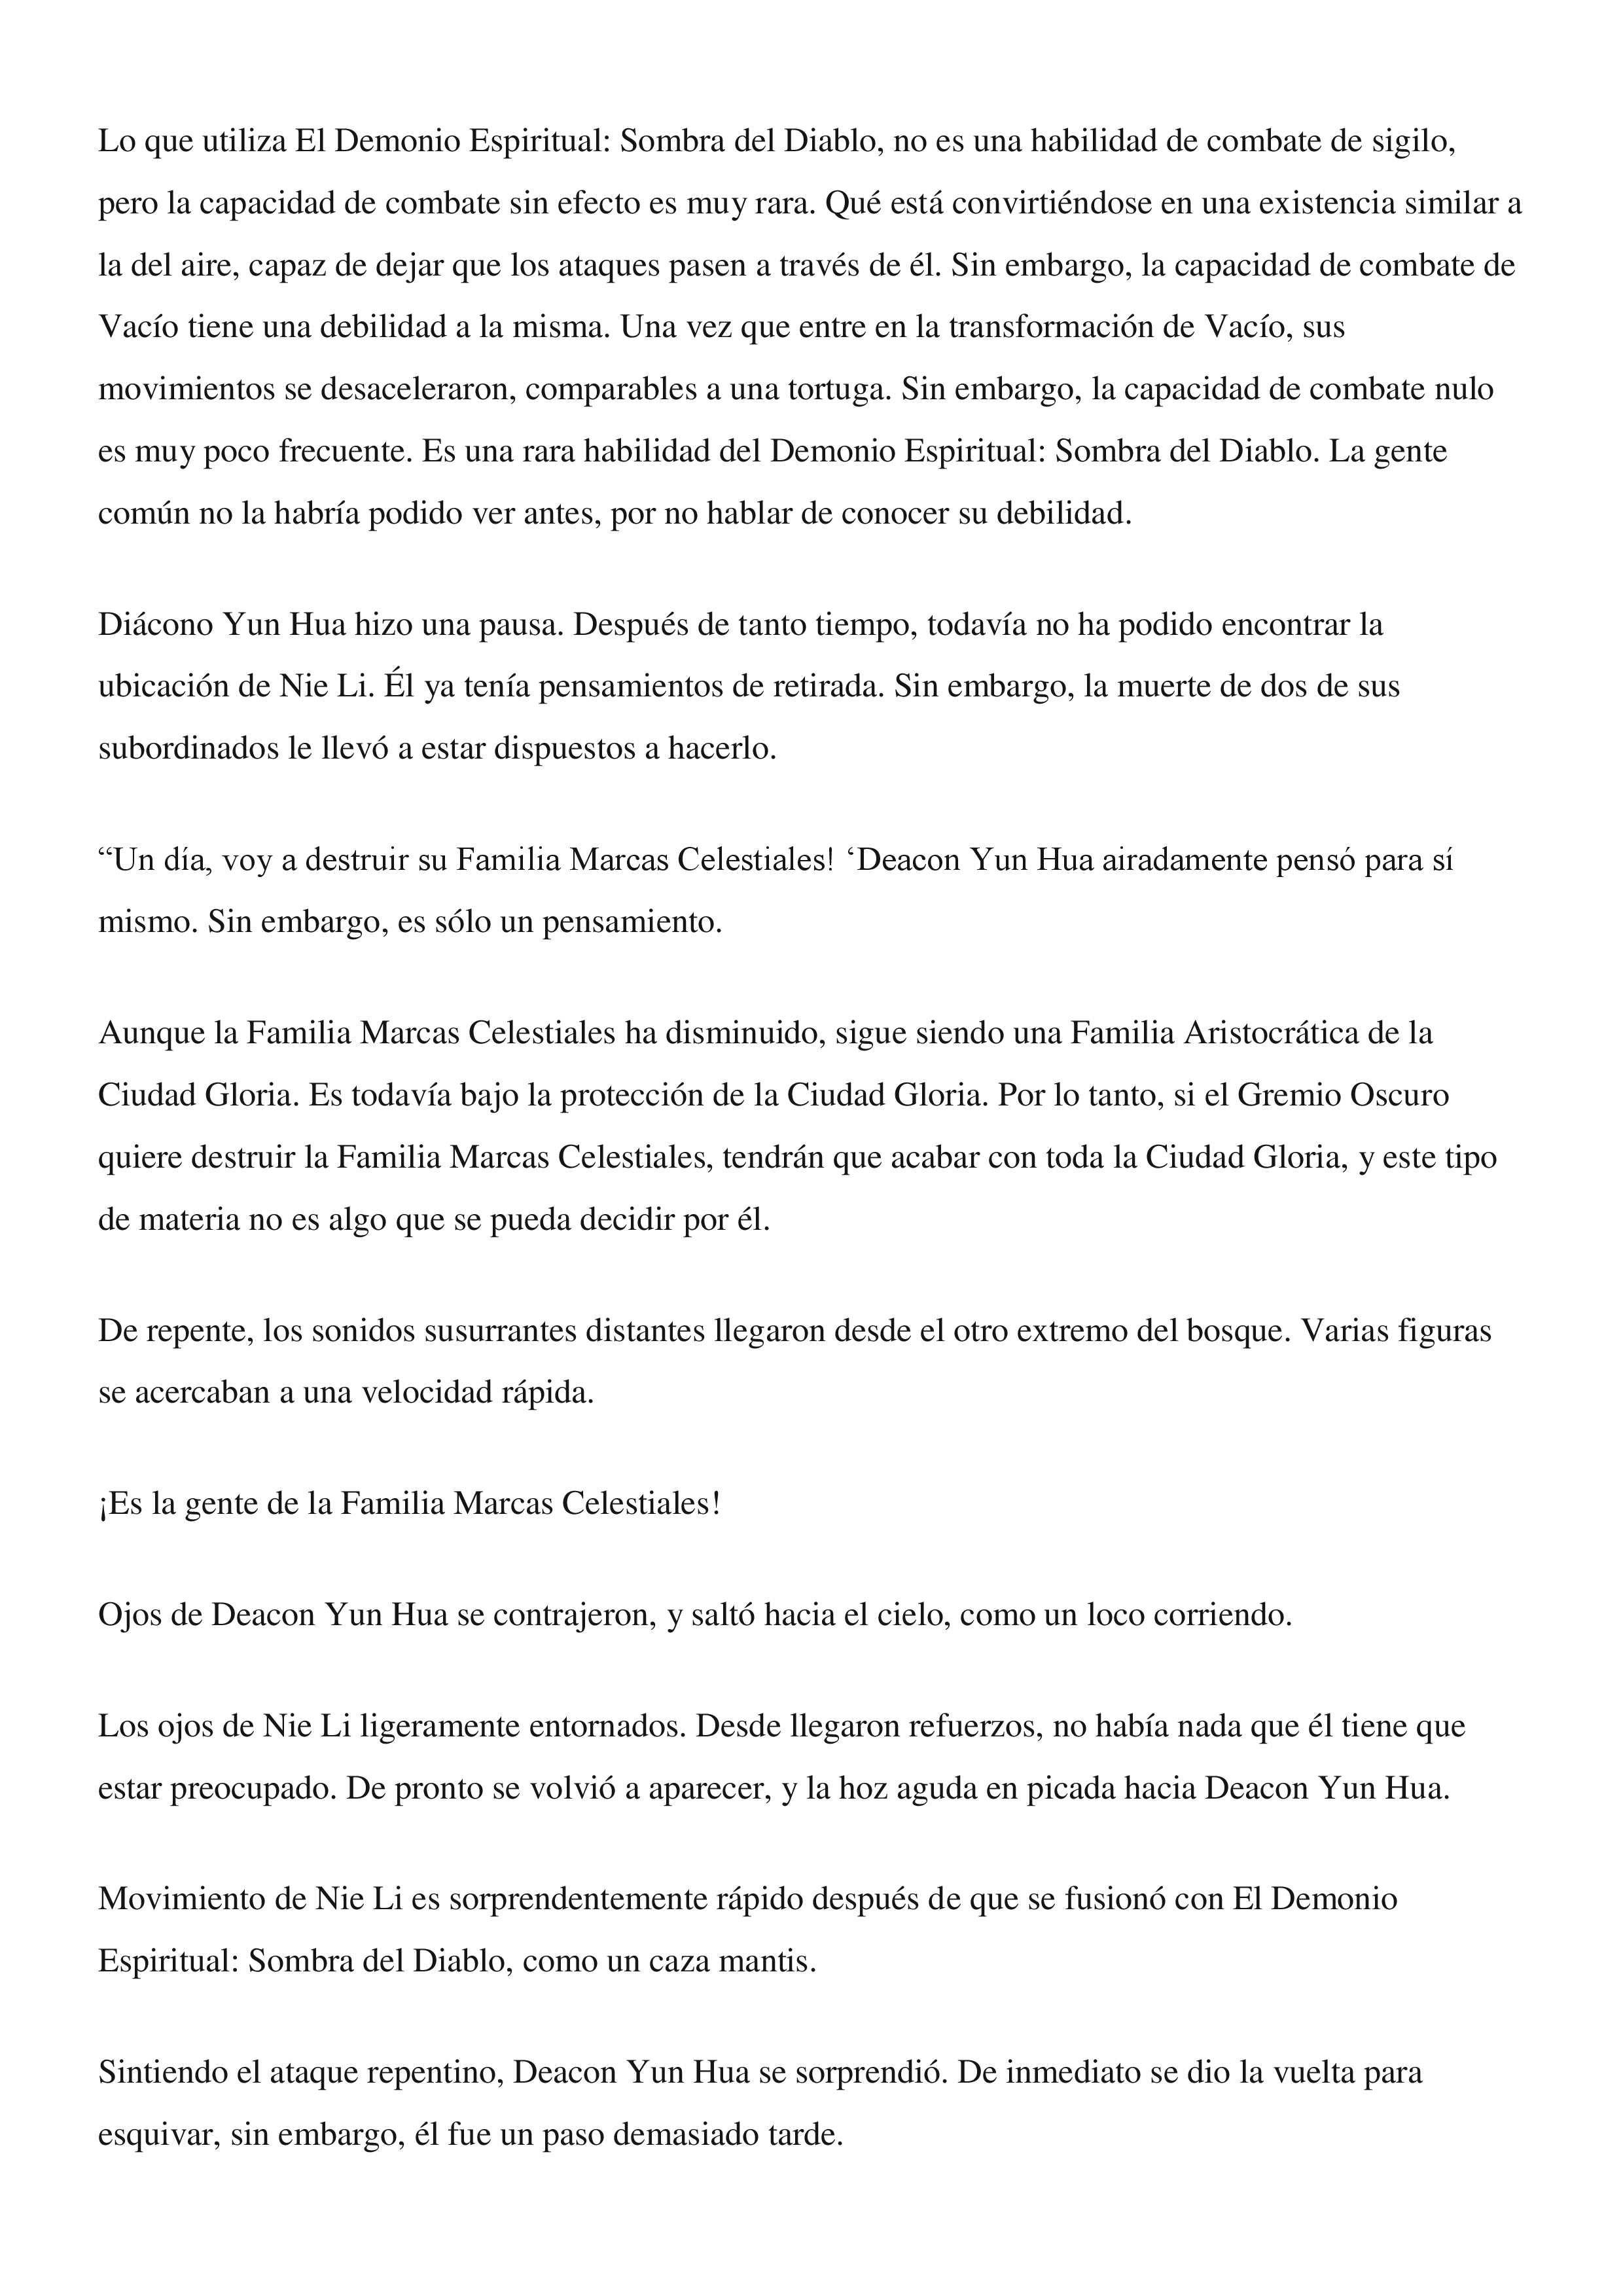 https://c5.ninemanga.com/es_manga/44/20012/487546/acc90c264f09d151c7a09da4c06877e8.jpg Page 4